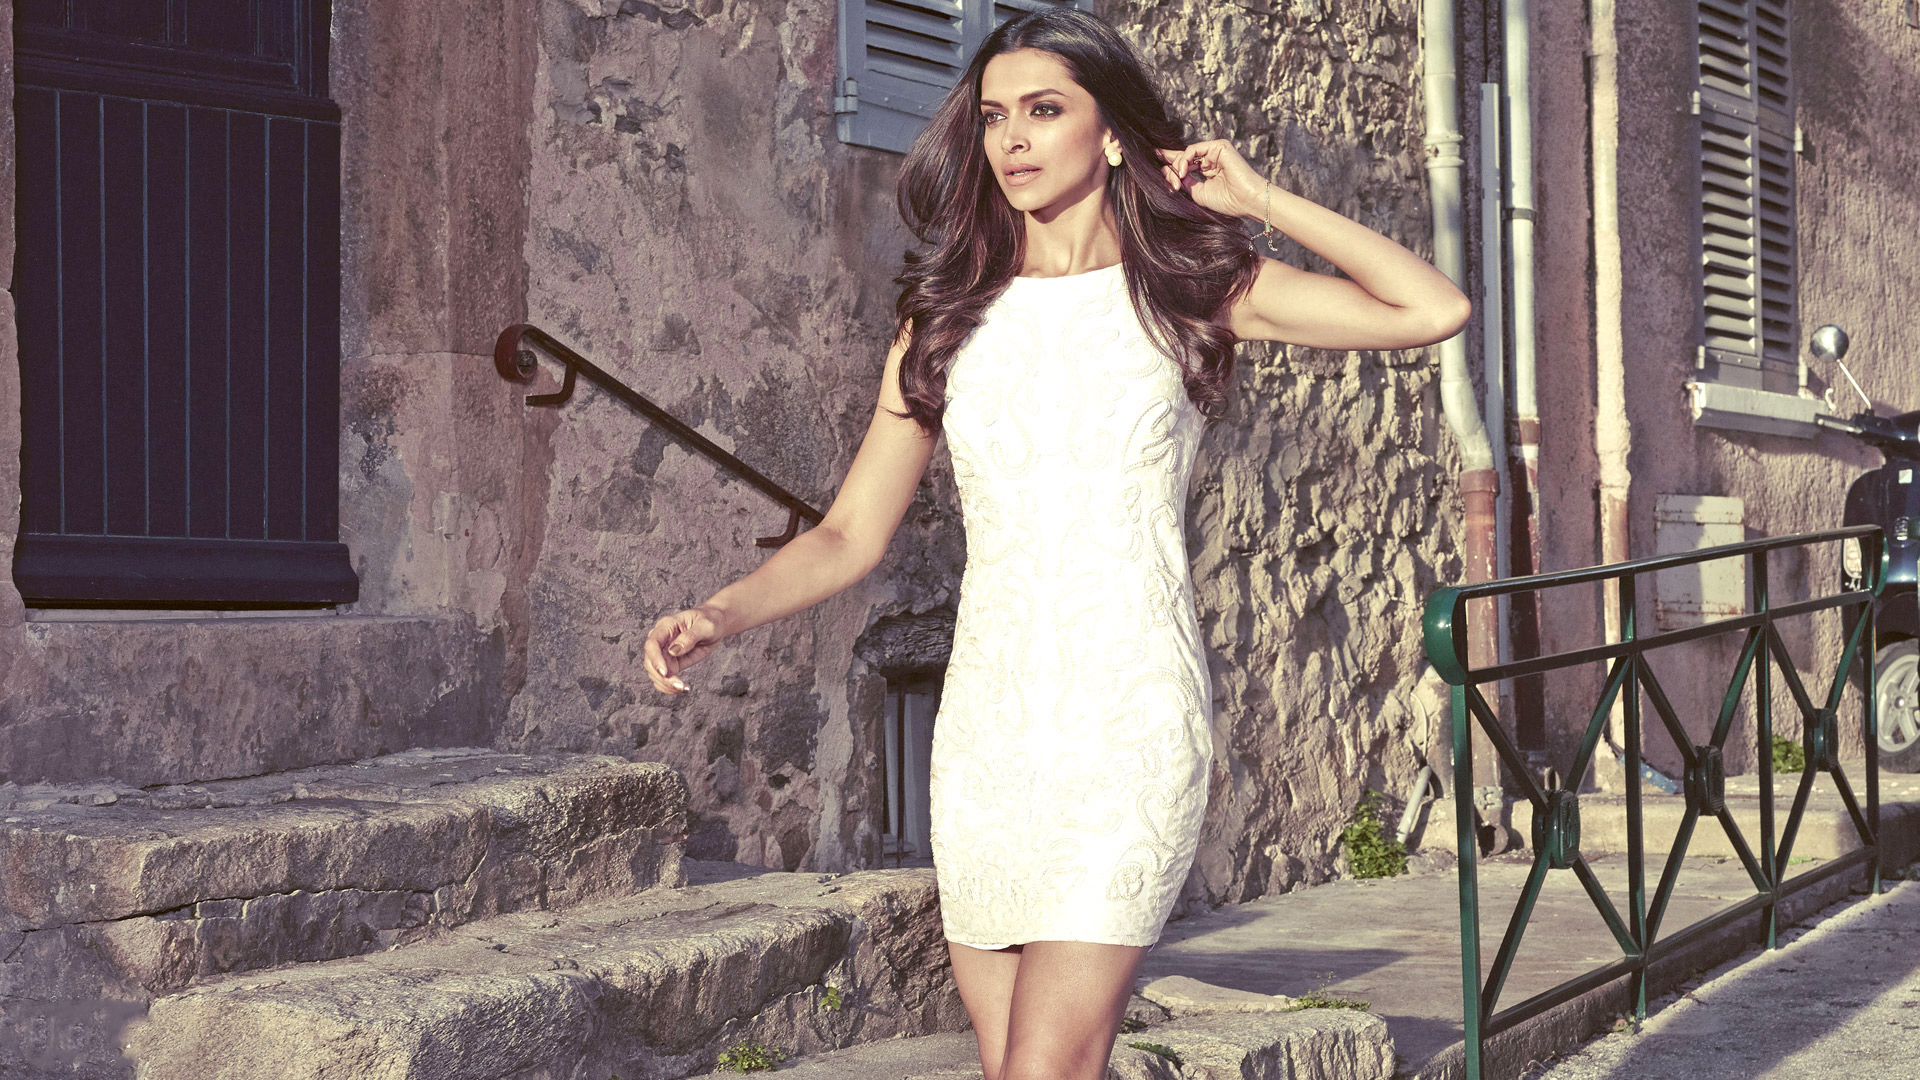 Deepika Padukone Classy Street Style Photoshoot Full HD Wallpaper